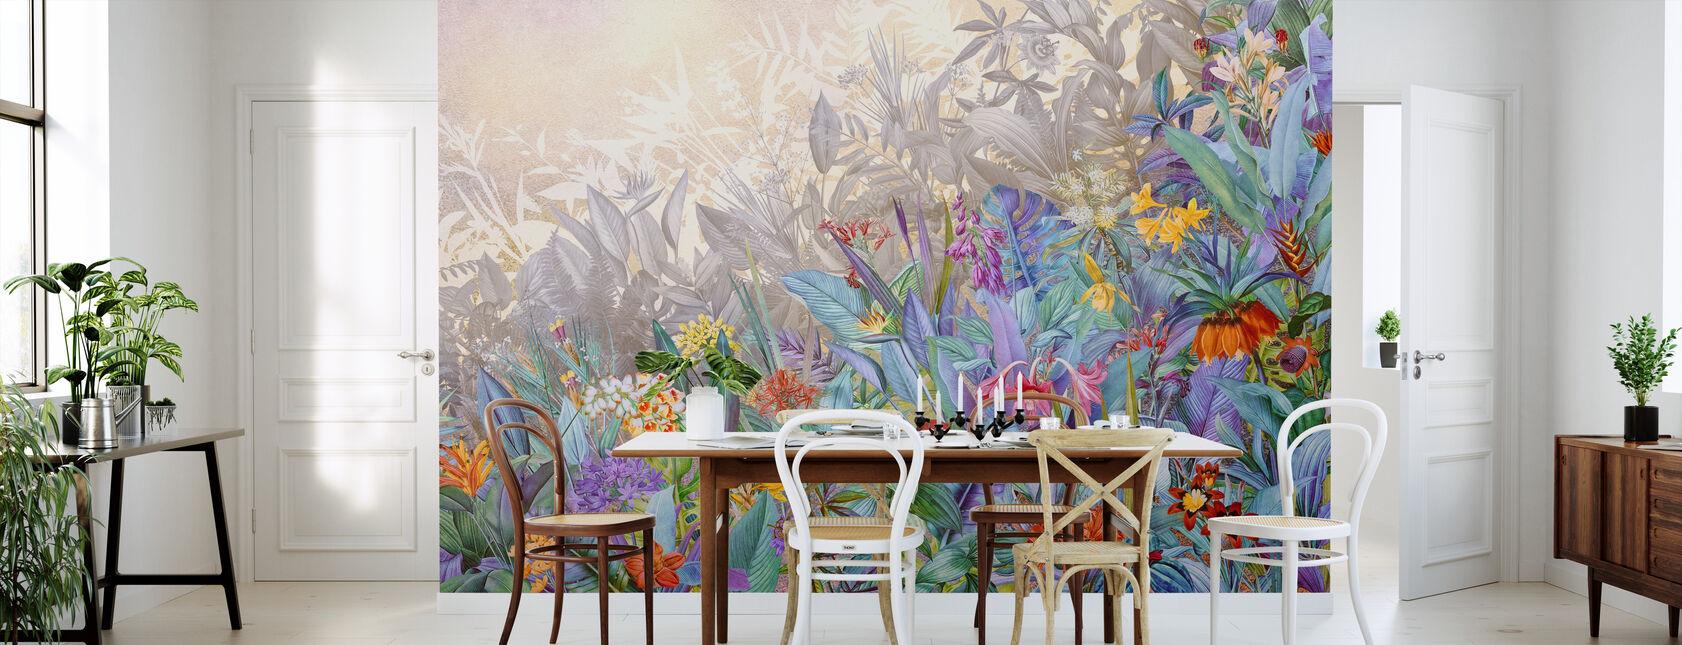 Colorful Blossom - Wallpaper - Kitchen